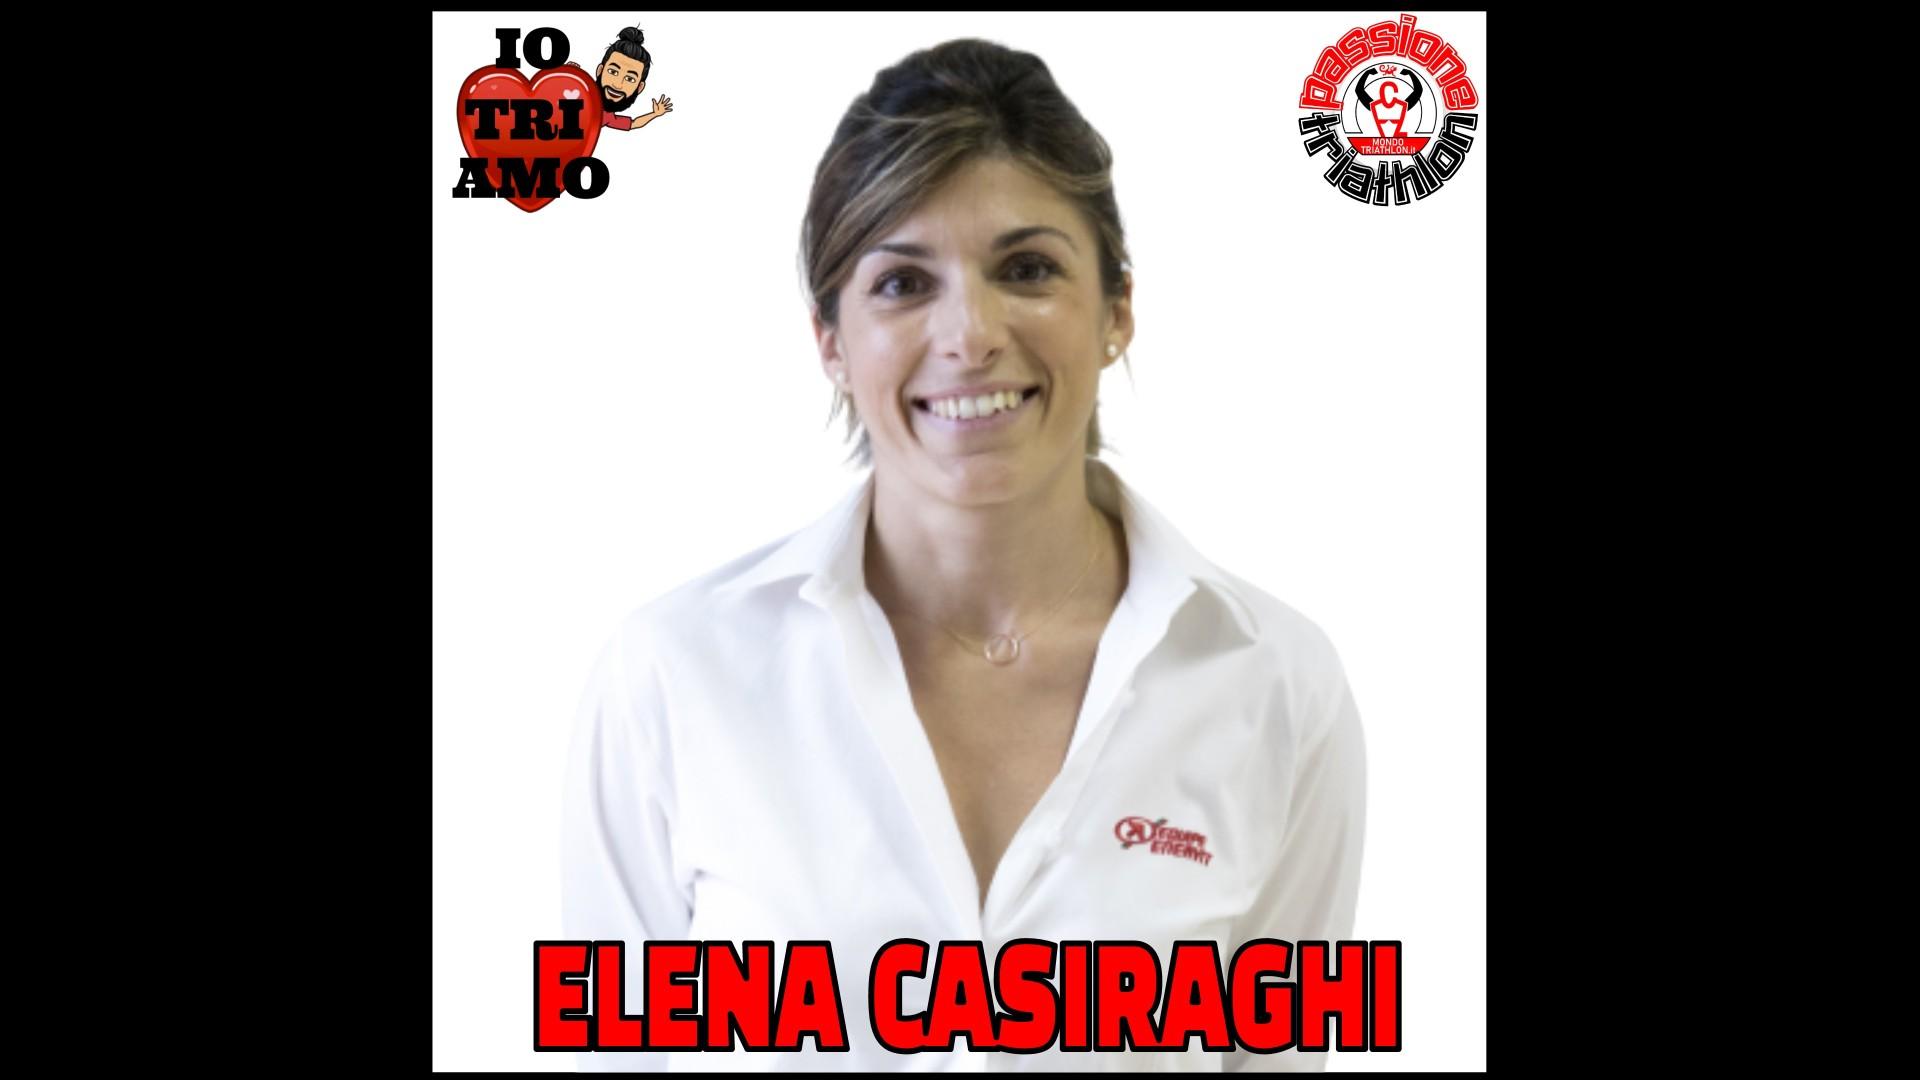 Elena Casiraghi Passione Triathlon n° 94